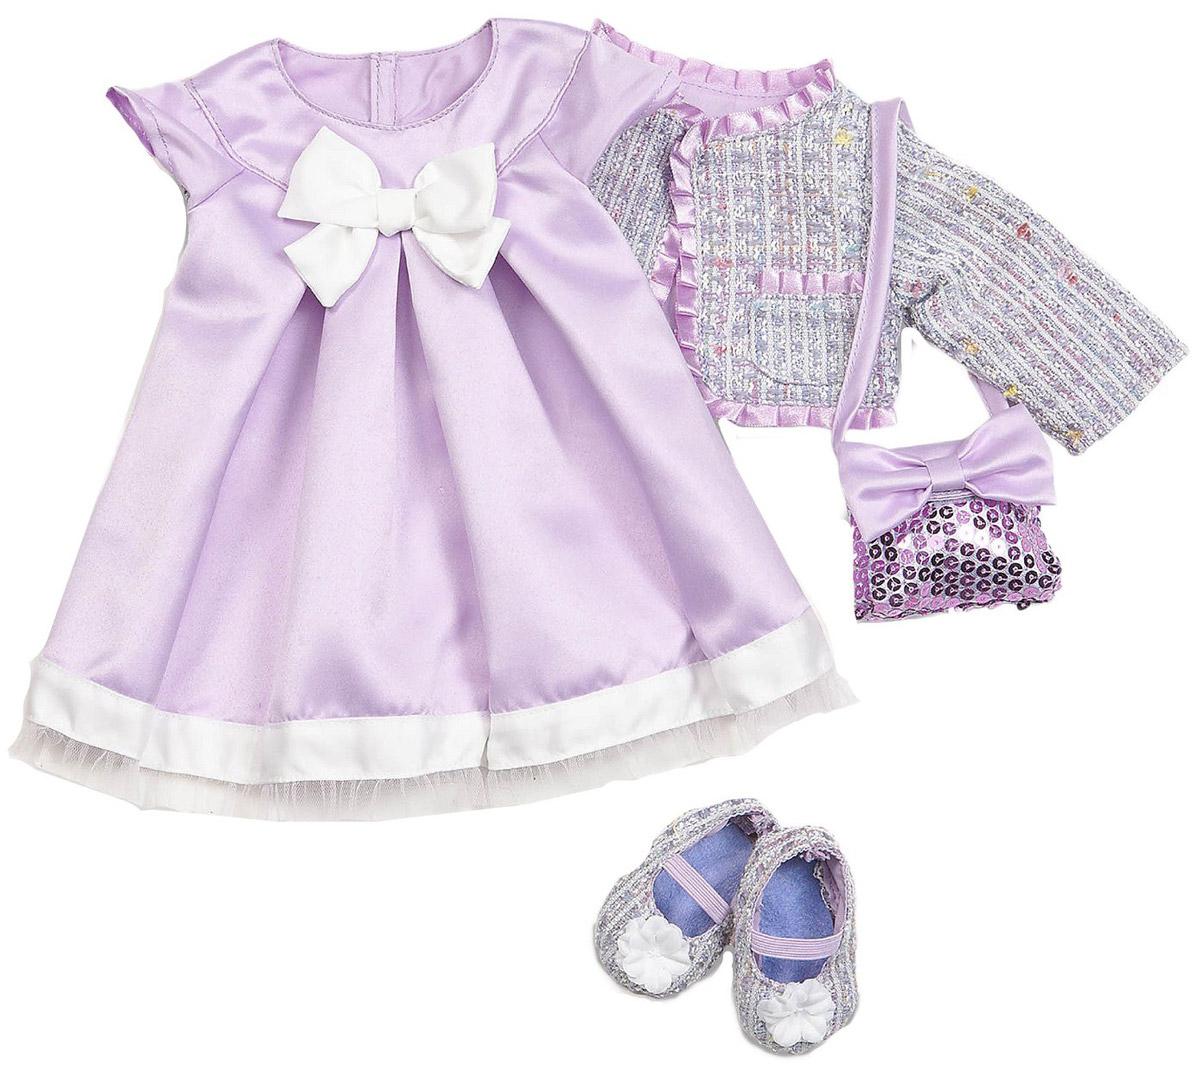 Our Generation Одежда для кукол Атласное платье жакет балетки